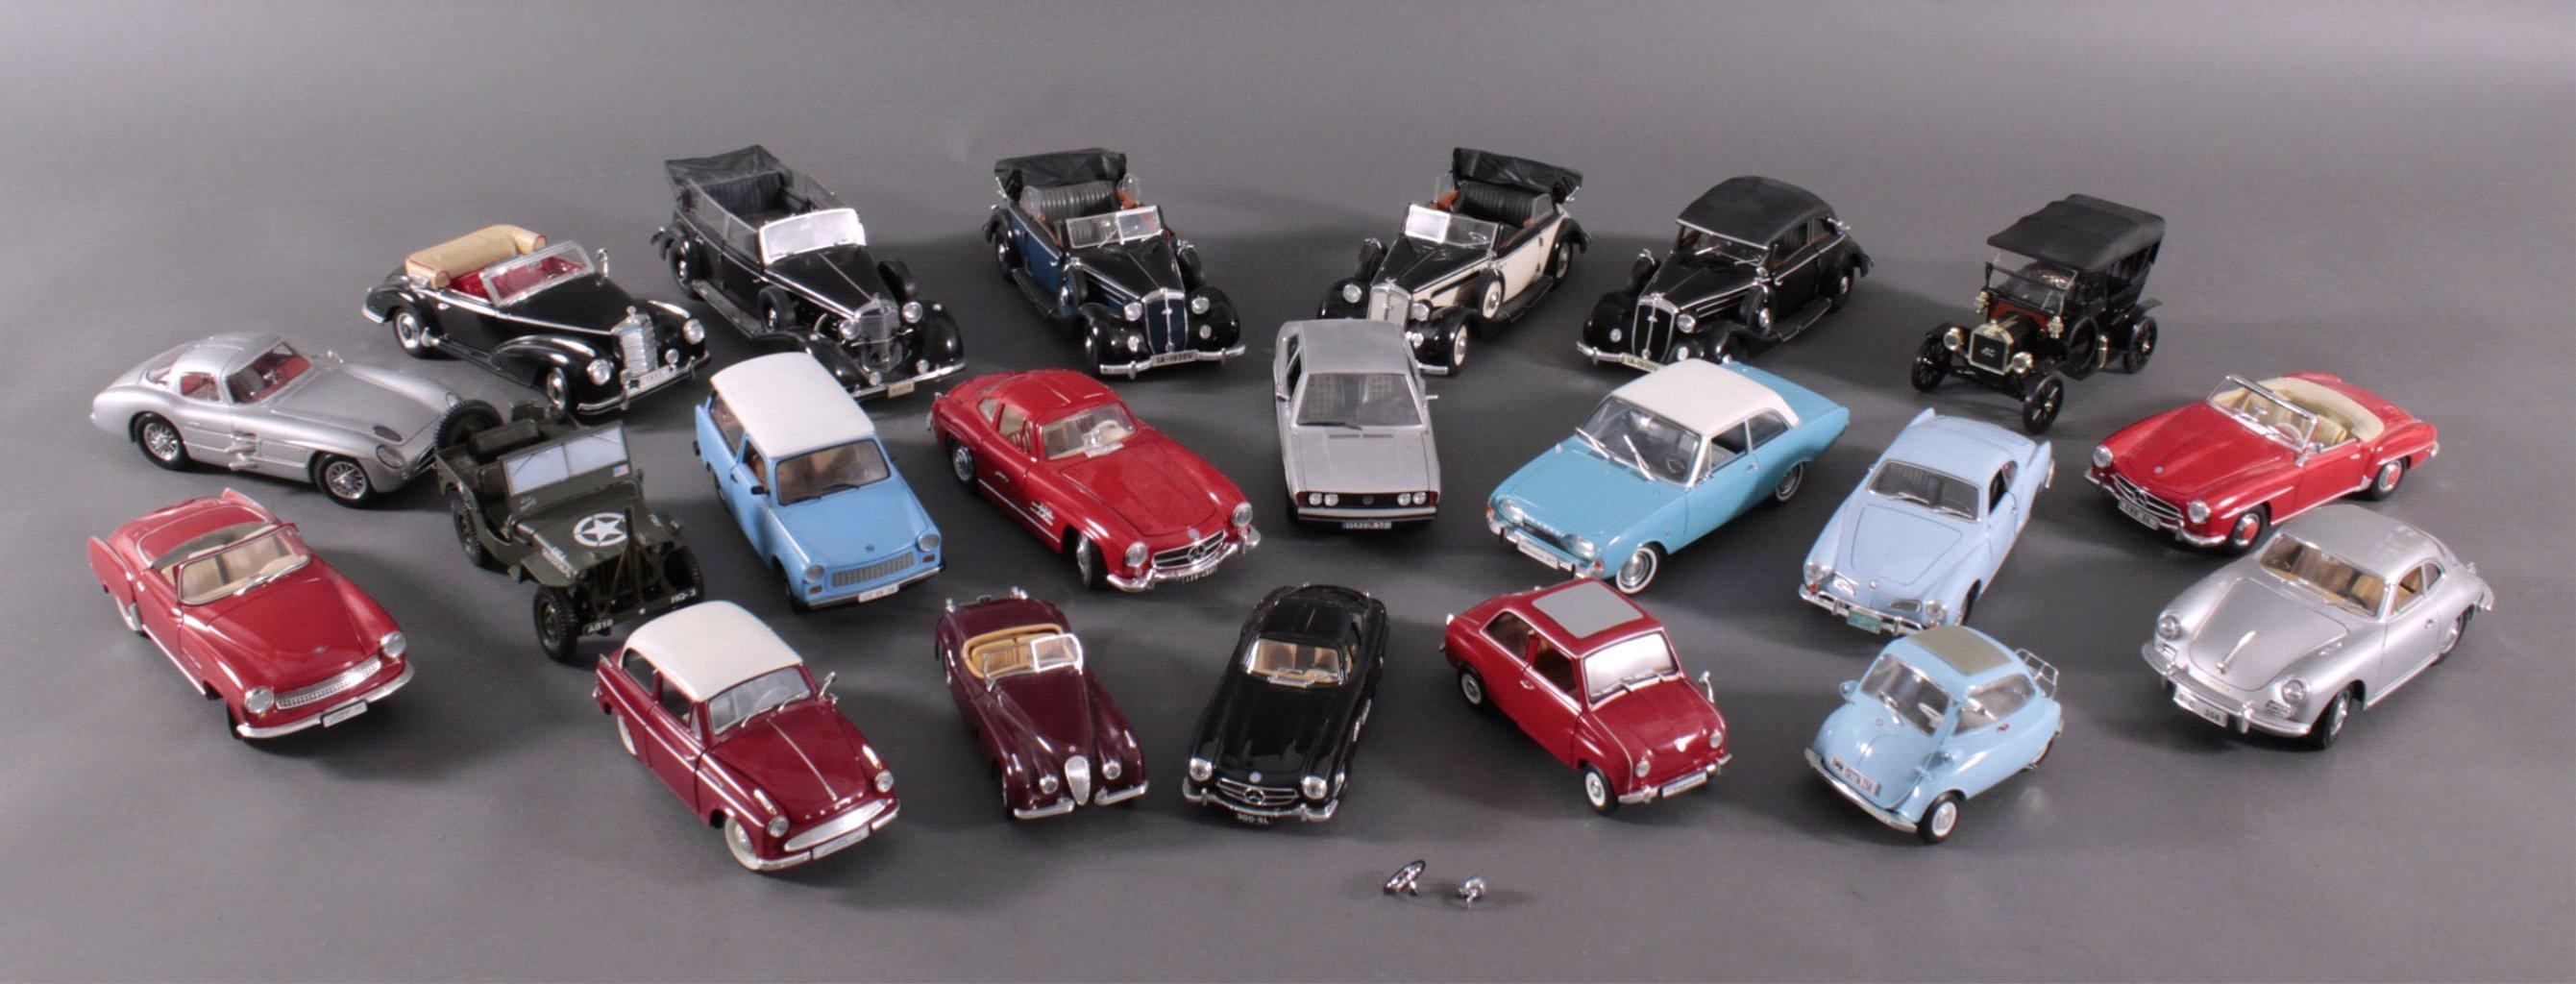 Sammlung Modellautos, 21 Stück